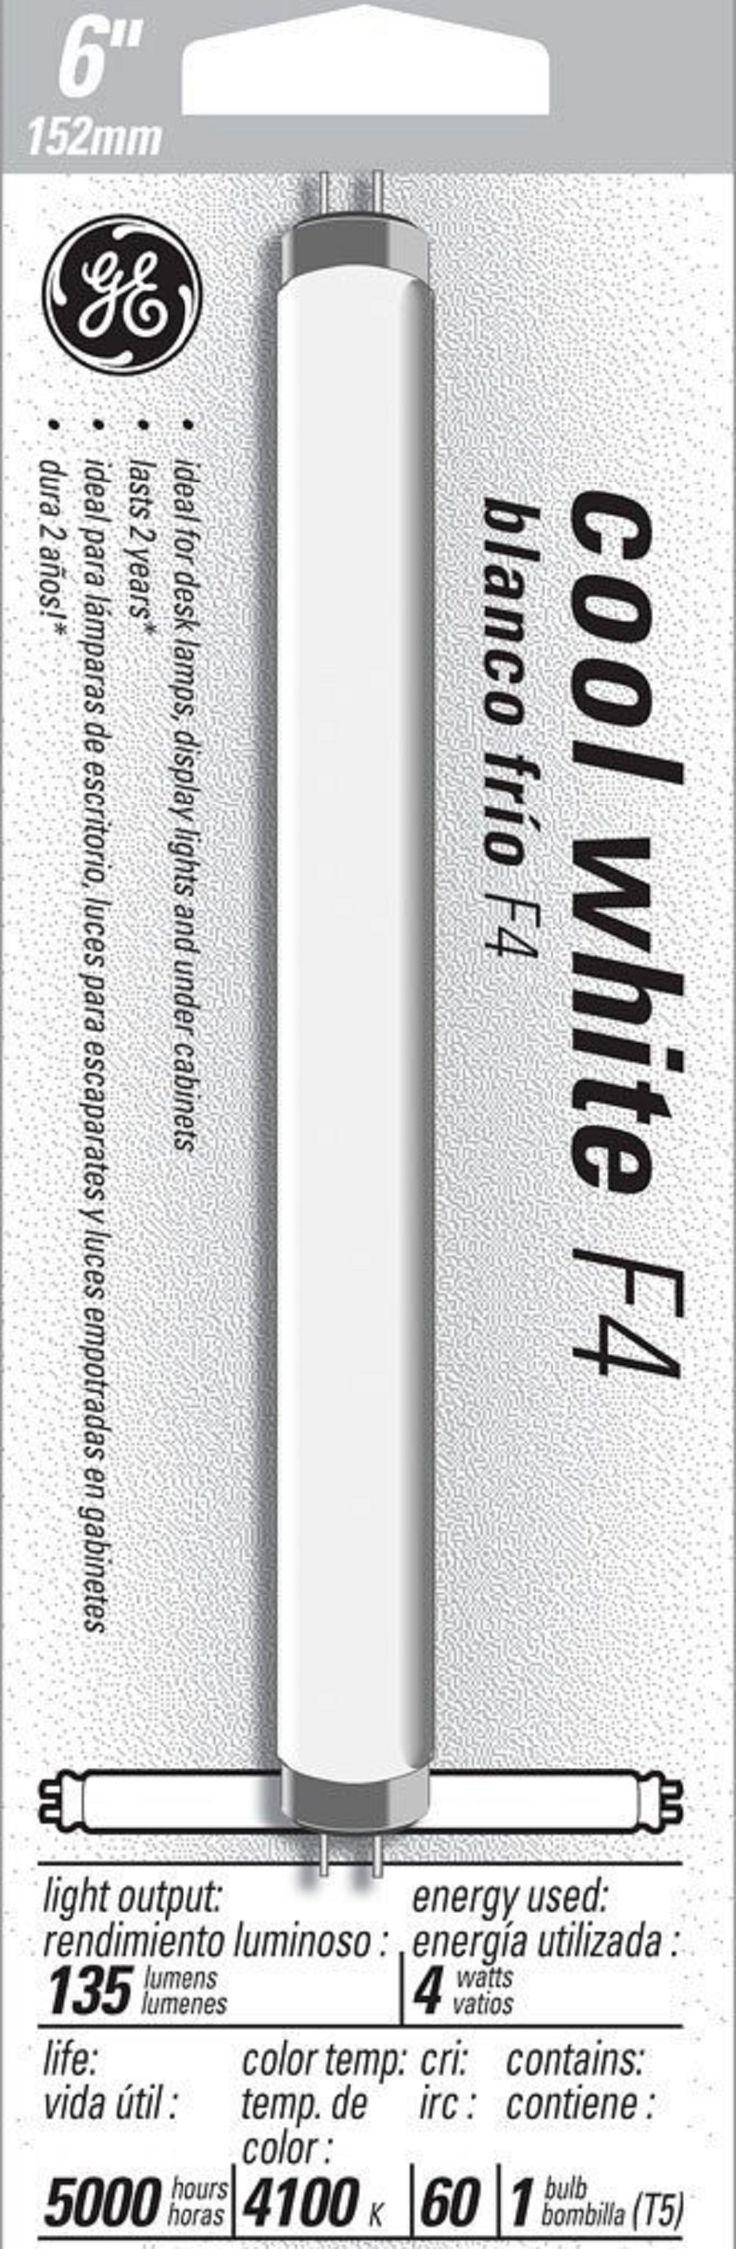 GE Garage and Basement 15983 4-Watt, 135-Lumen T5 Light Bulb with Miniature Bi-Pin (G5) Base